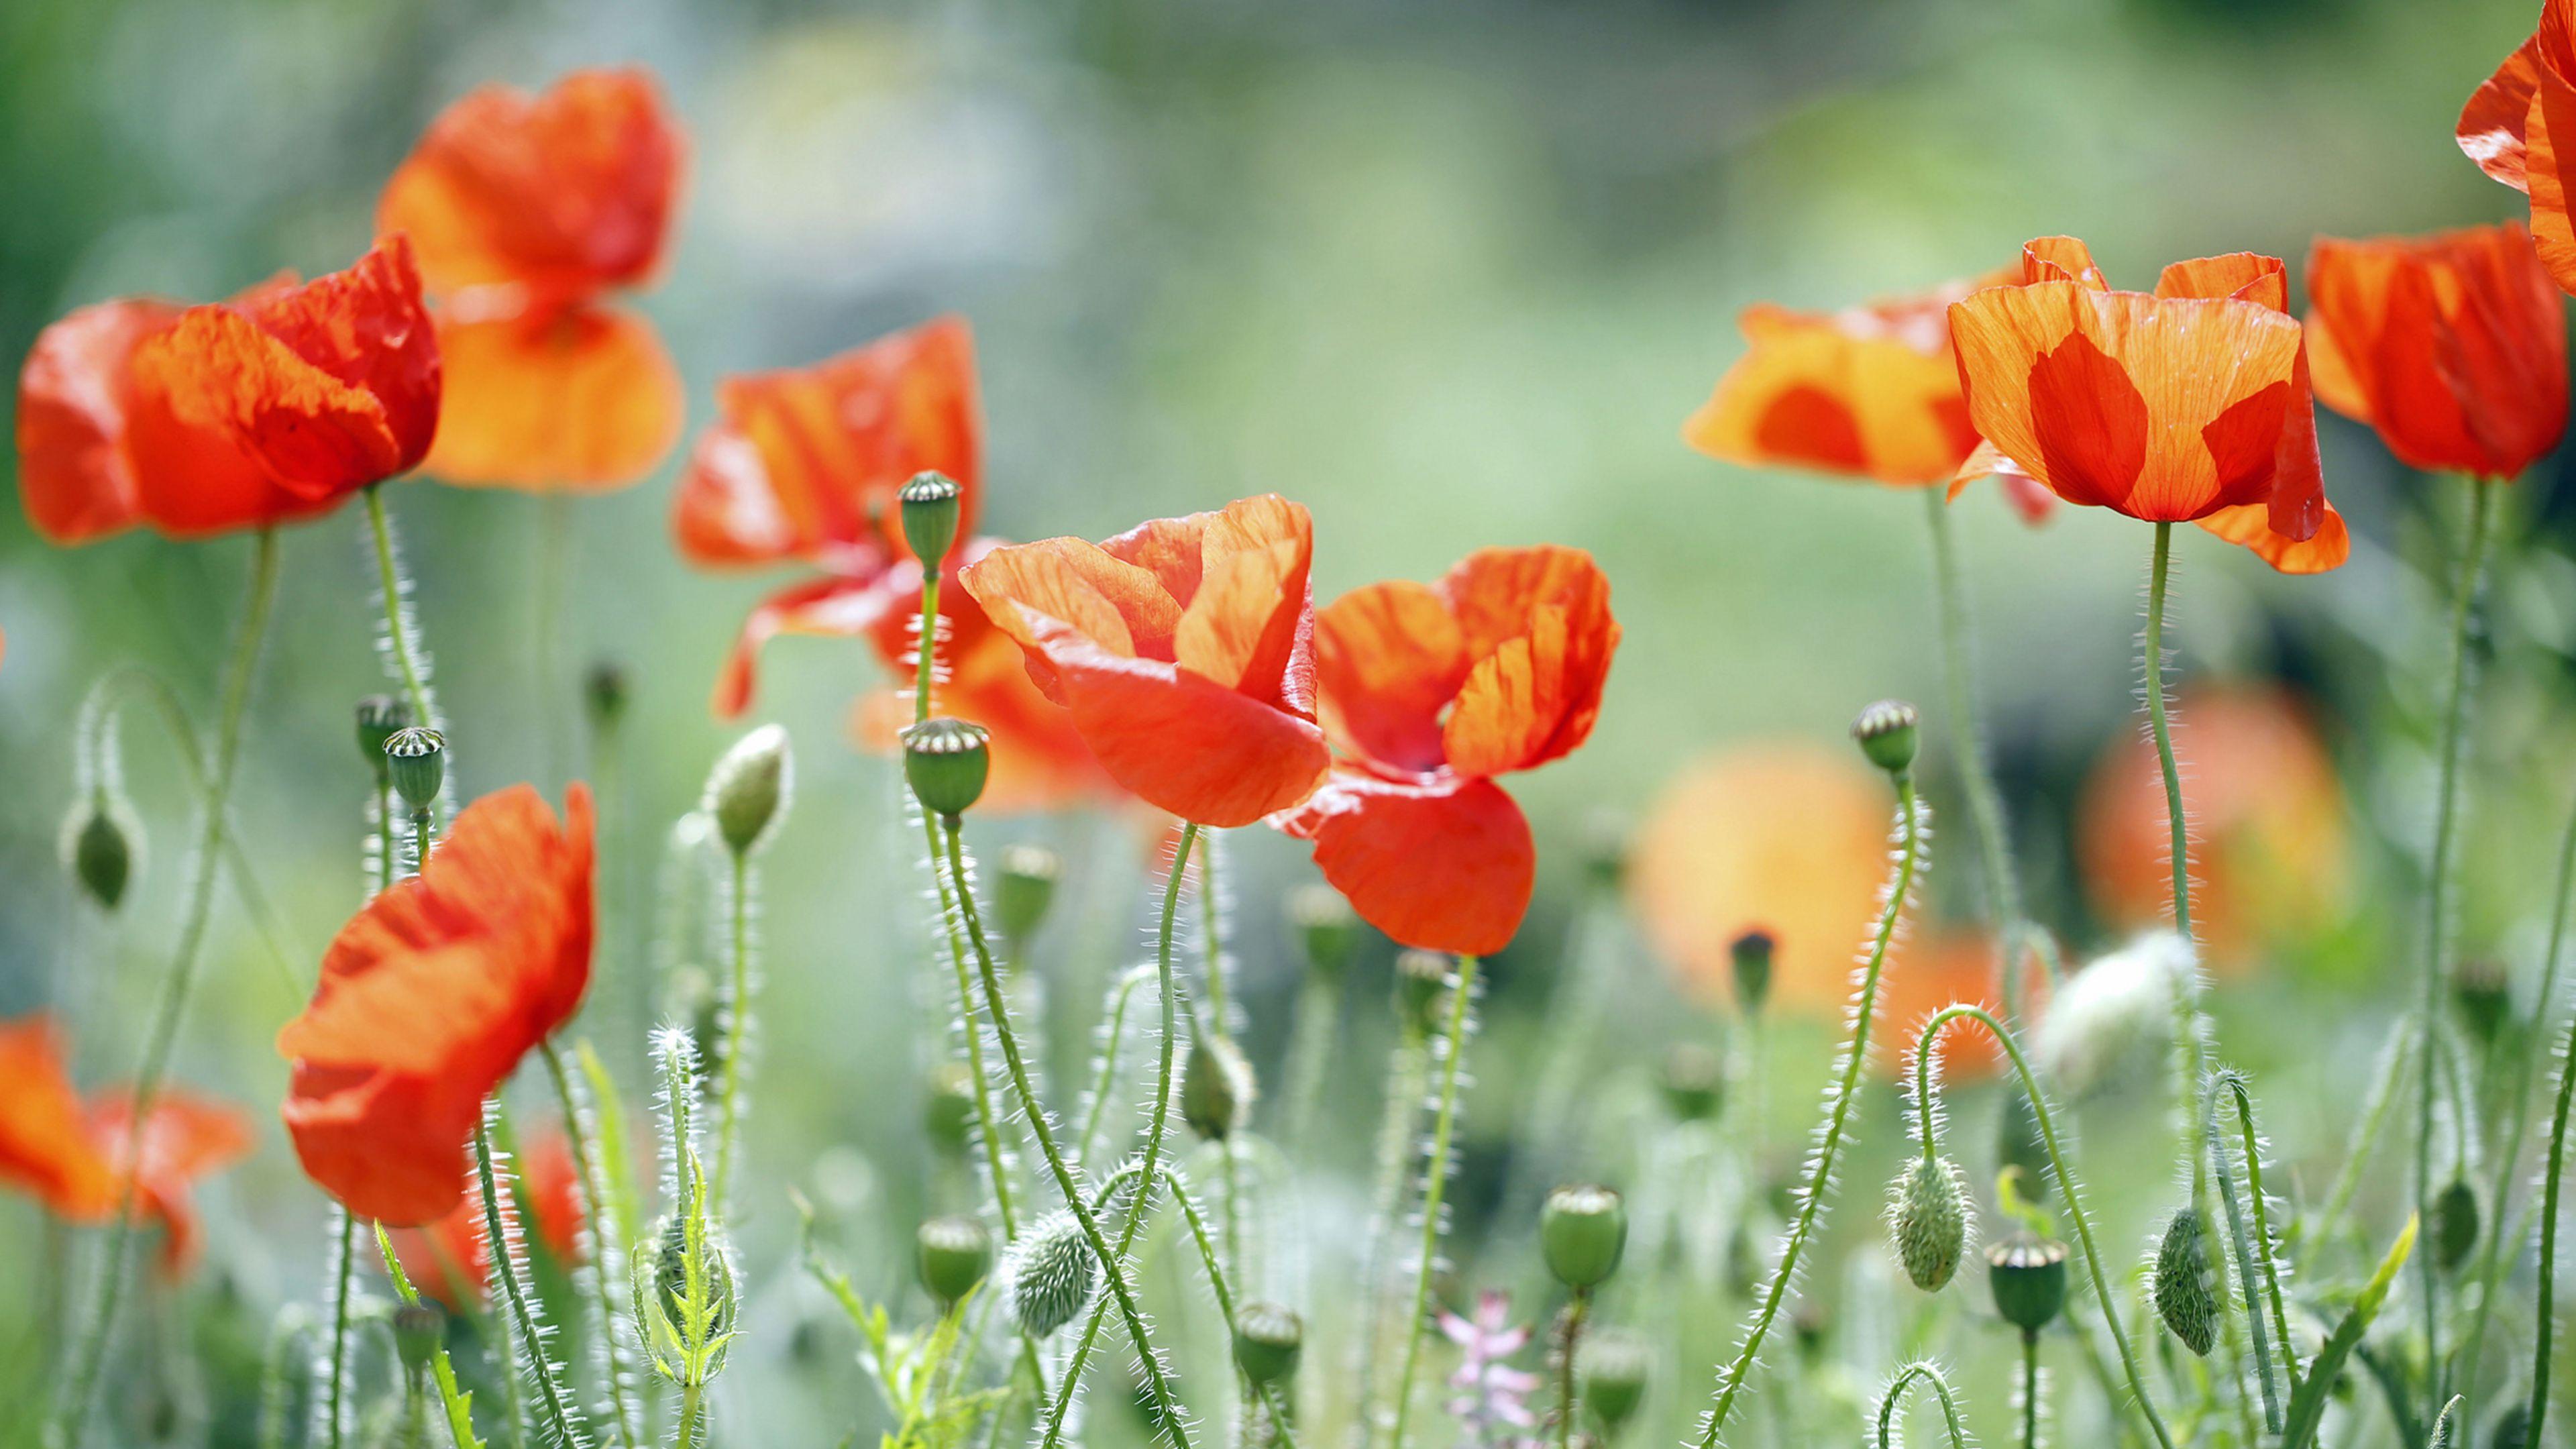 95d26295b469b49c254b41303abb3d1c Luxe De Fleurs De Jardin Des Idées